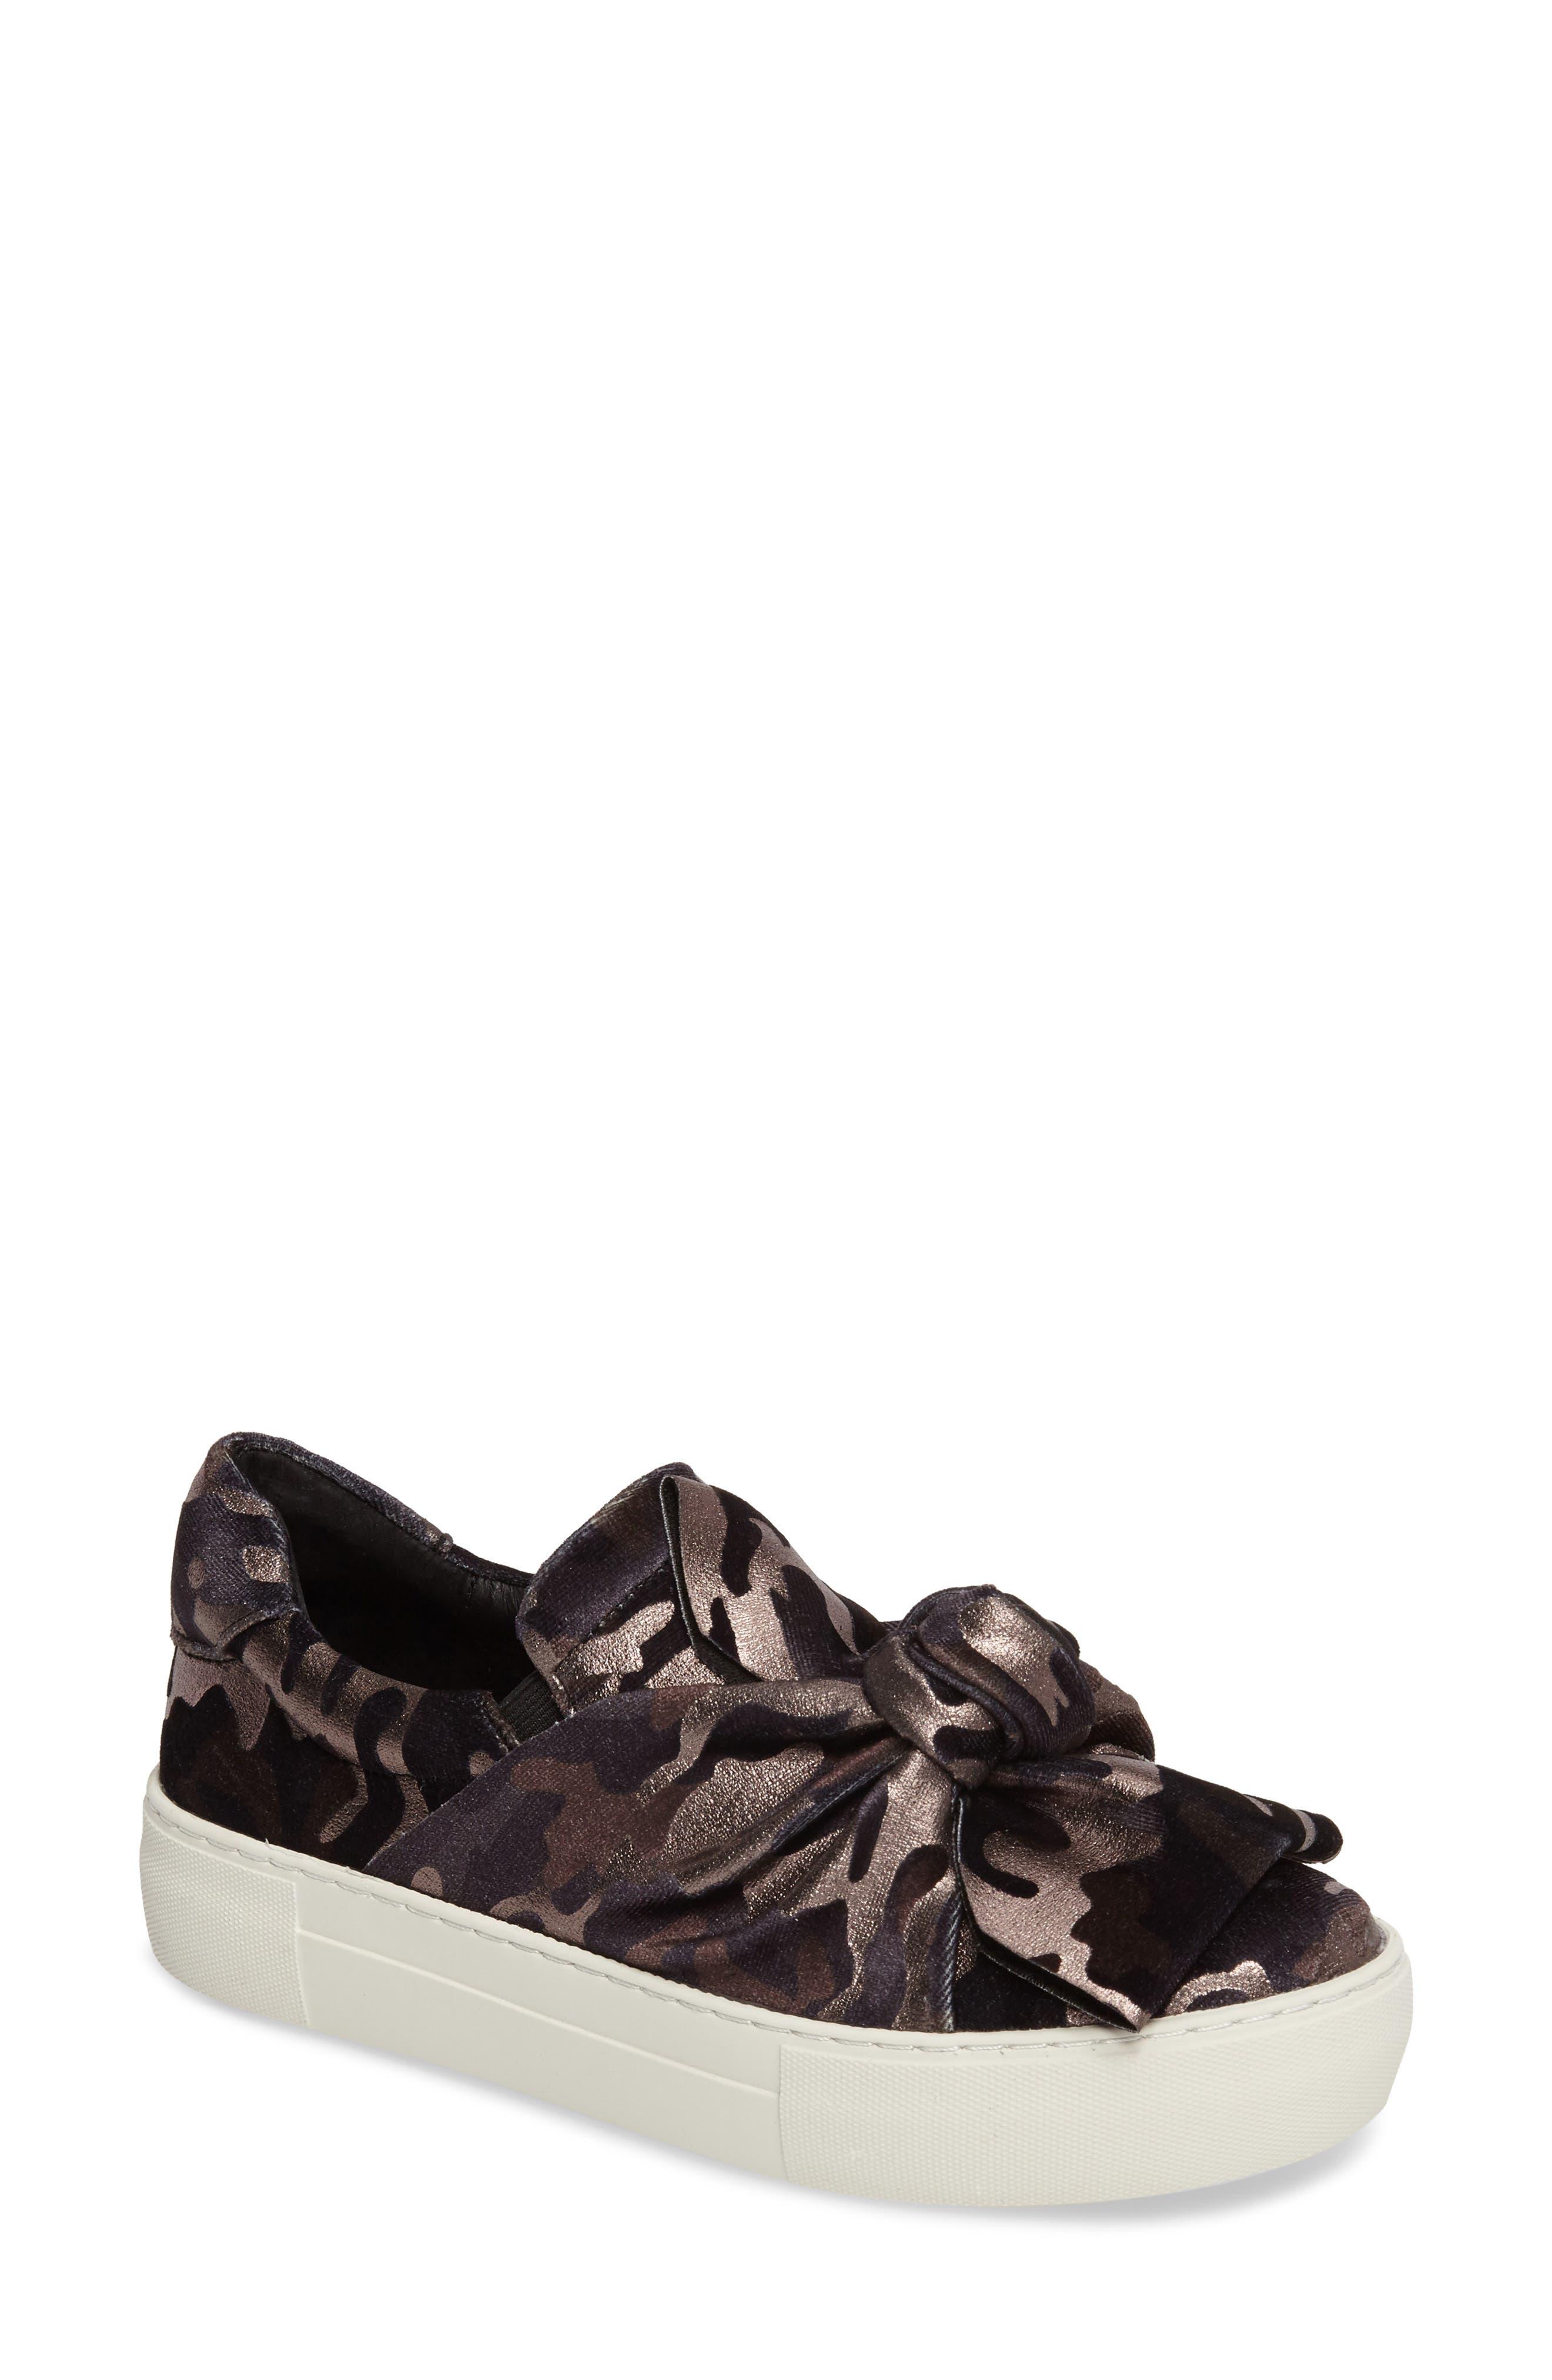 Audra Slip-On Sneaker,                             Main thumbnail 1, color,                             Black Camo Fabric